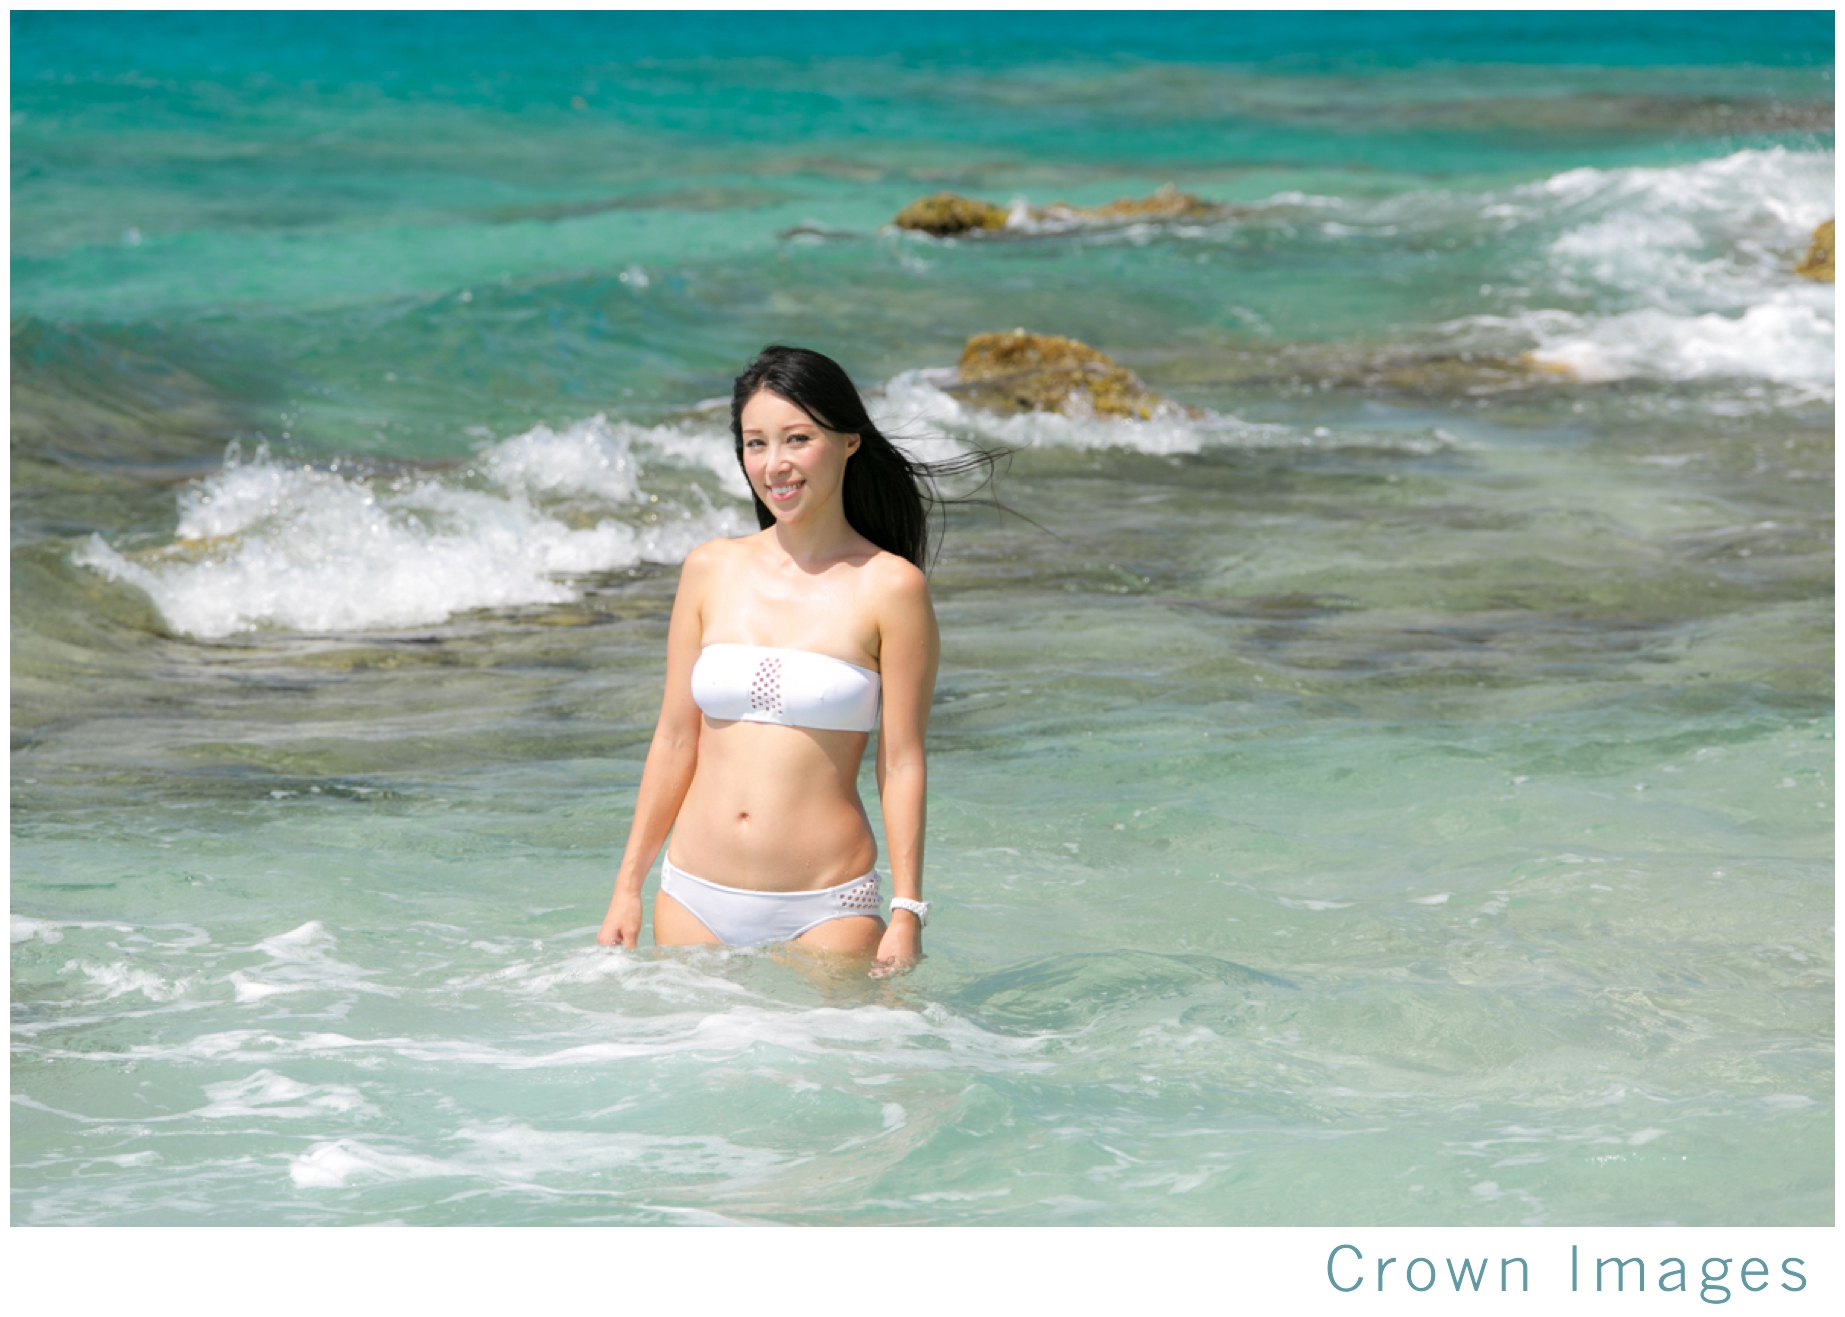 st_thomas_photographer_crown_images_0064.jpg